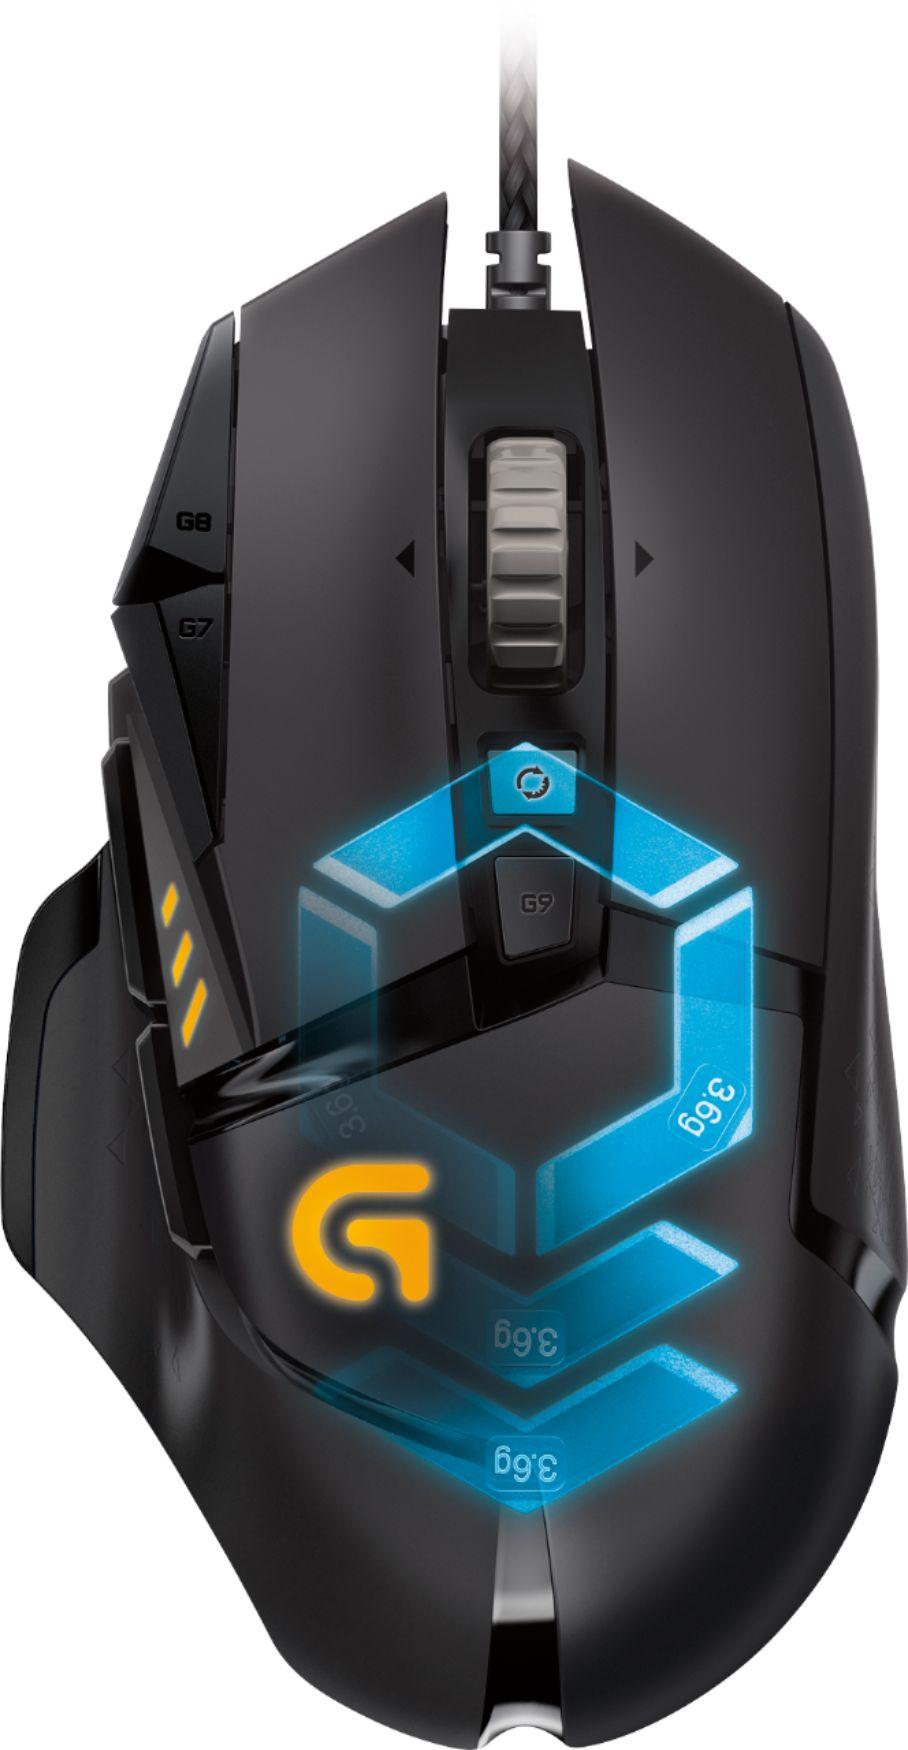 Logitech G502 Proteus Spectrum Optical Gaming Mouse Black 910-004615